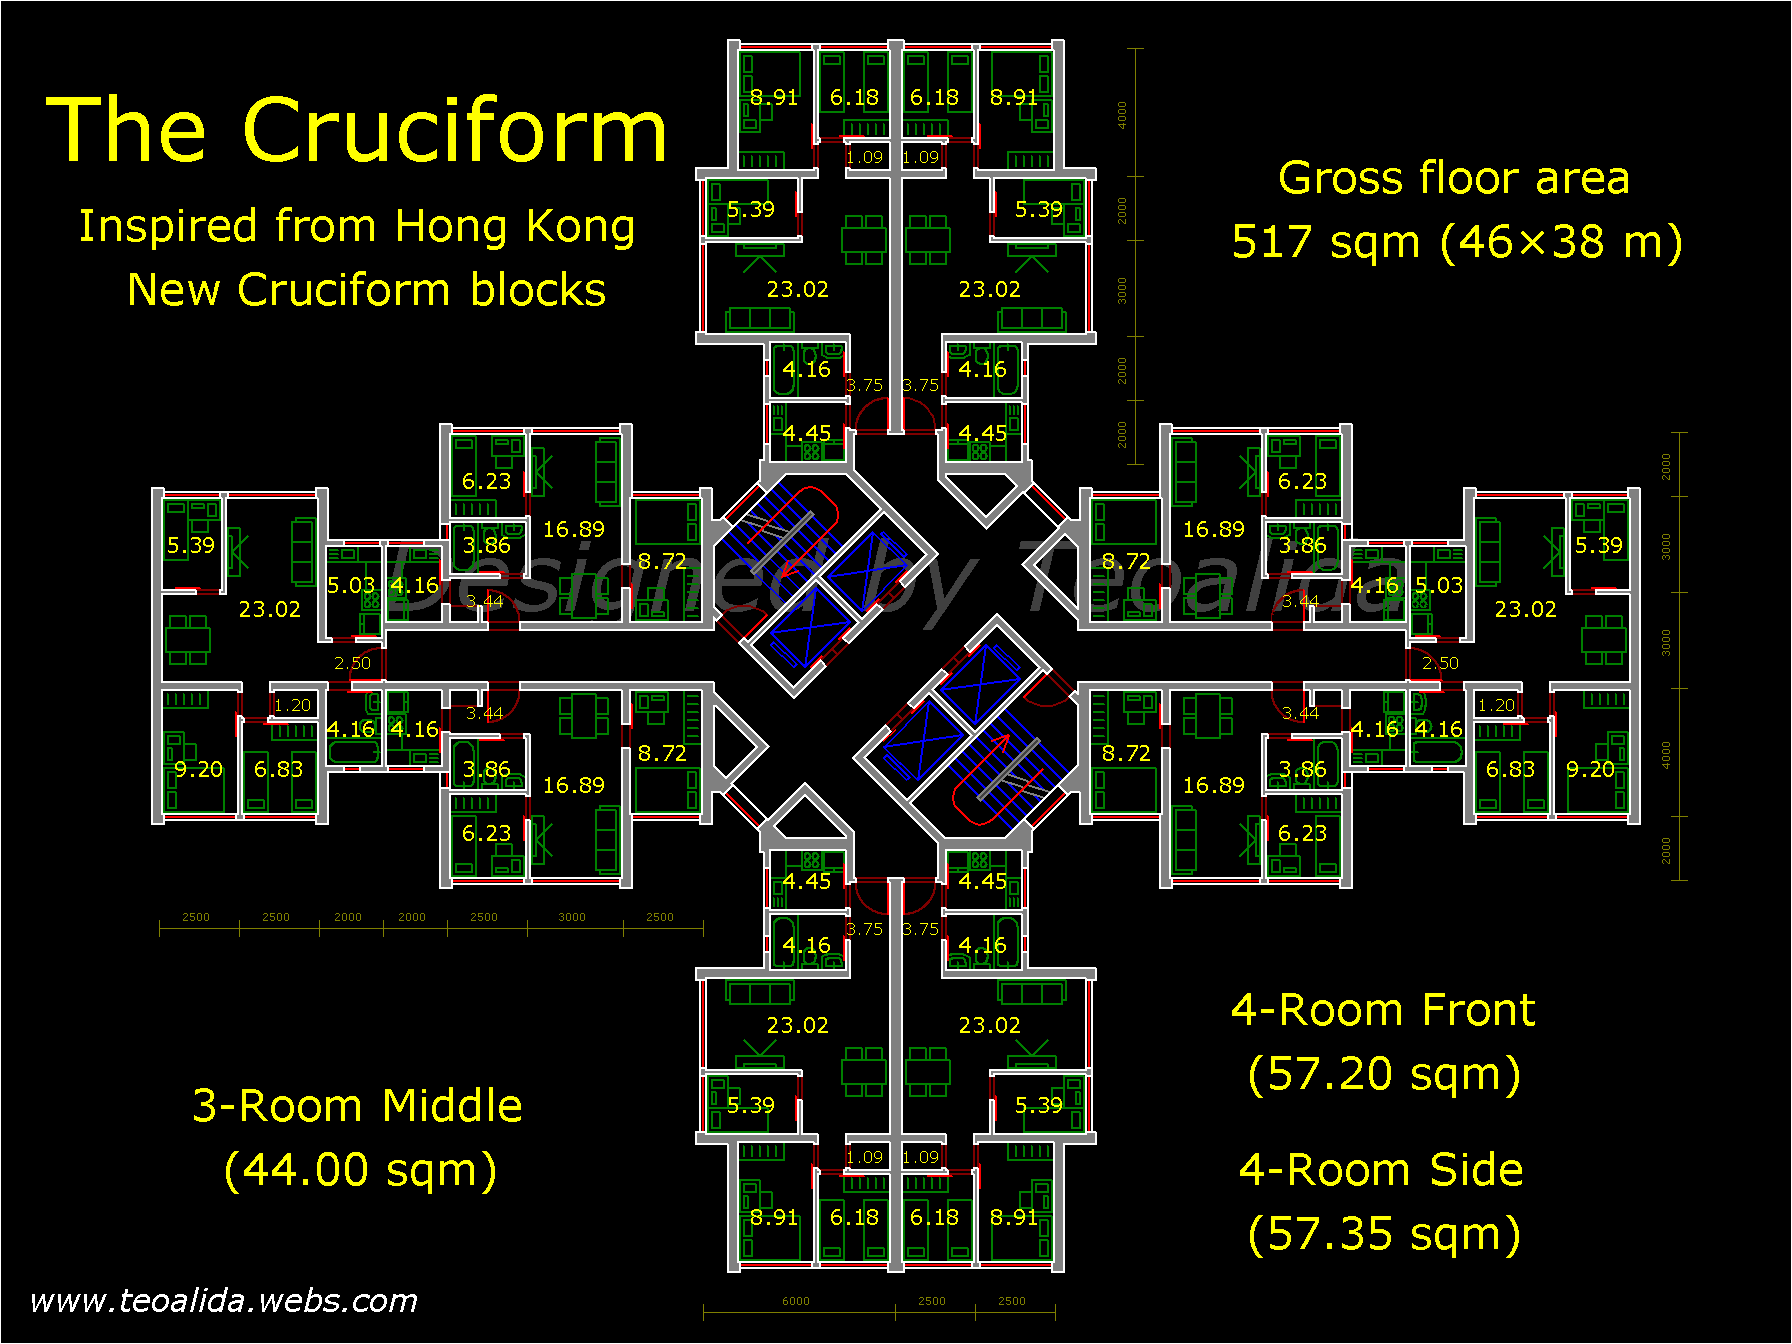 HK Cruciform